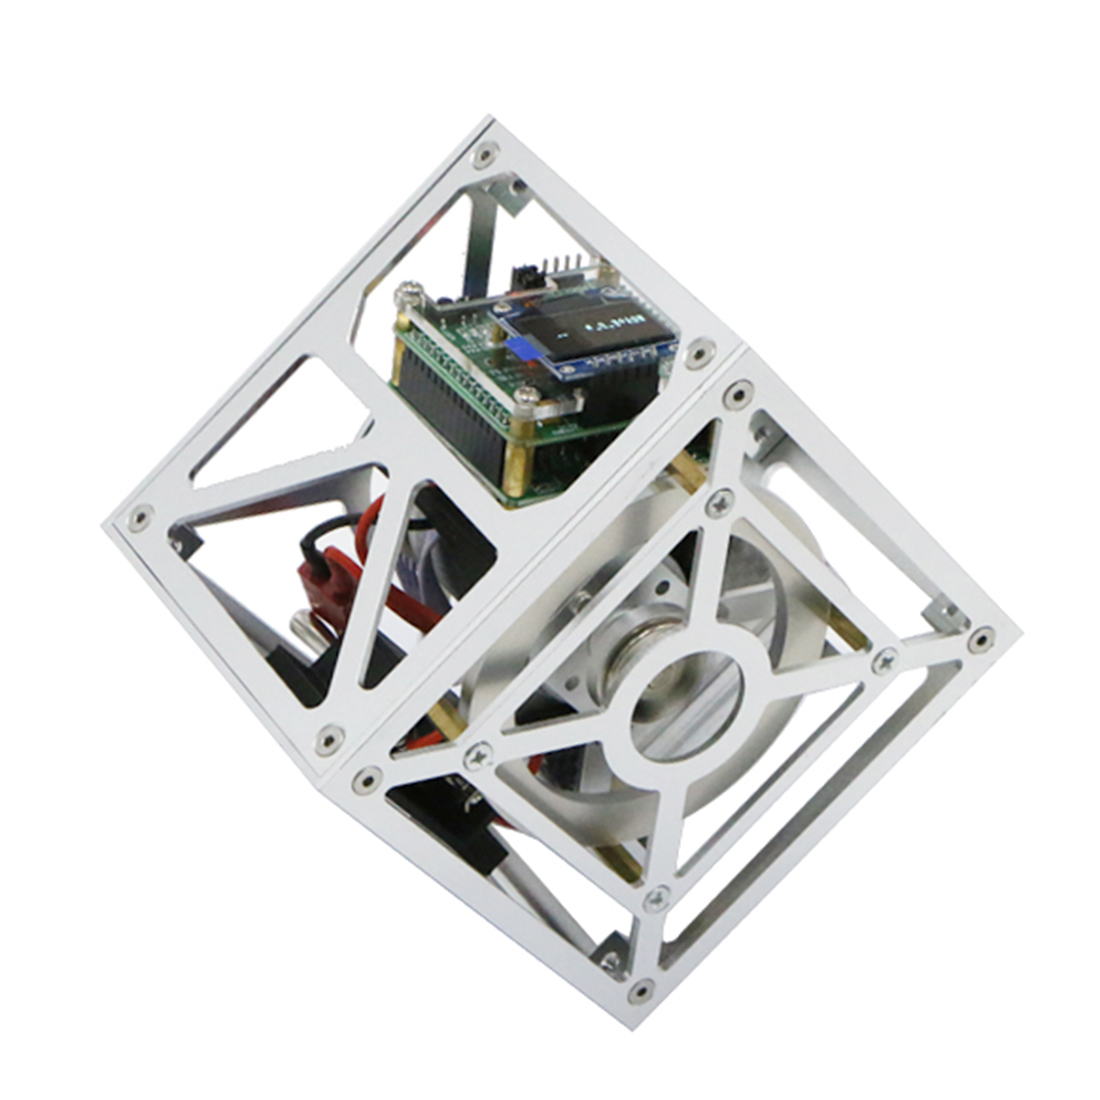 New Programmable Toy Single Point Balance Block Unilateral Self-balancing Cubli Block Intelligent Steam Kit